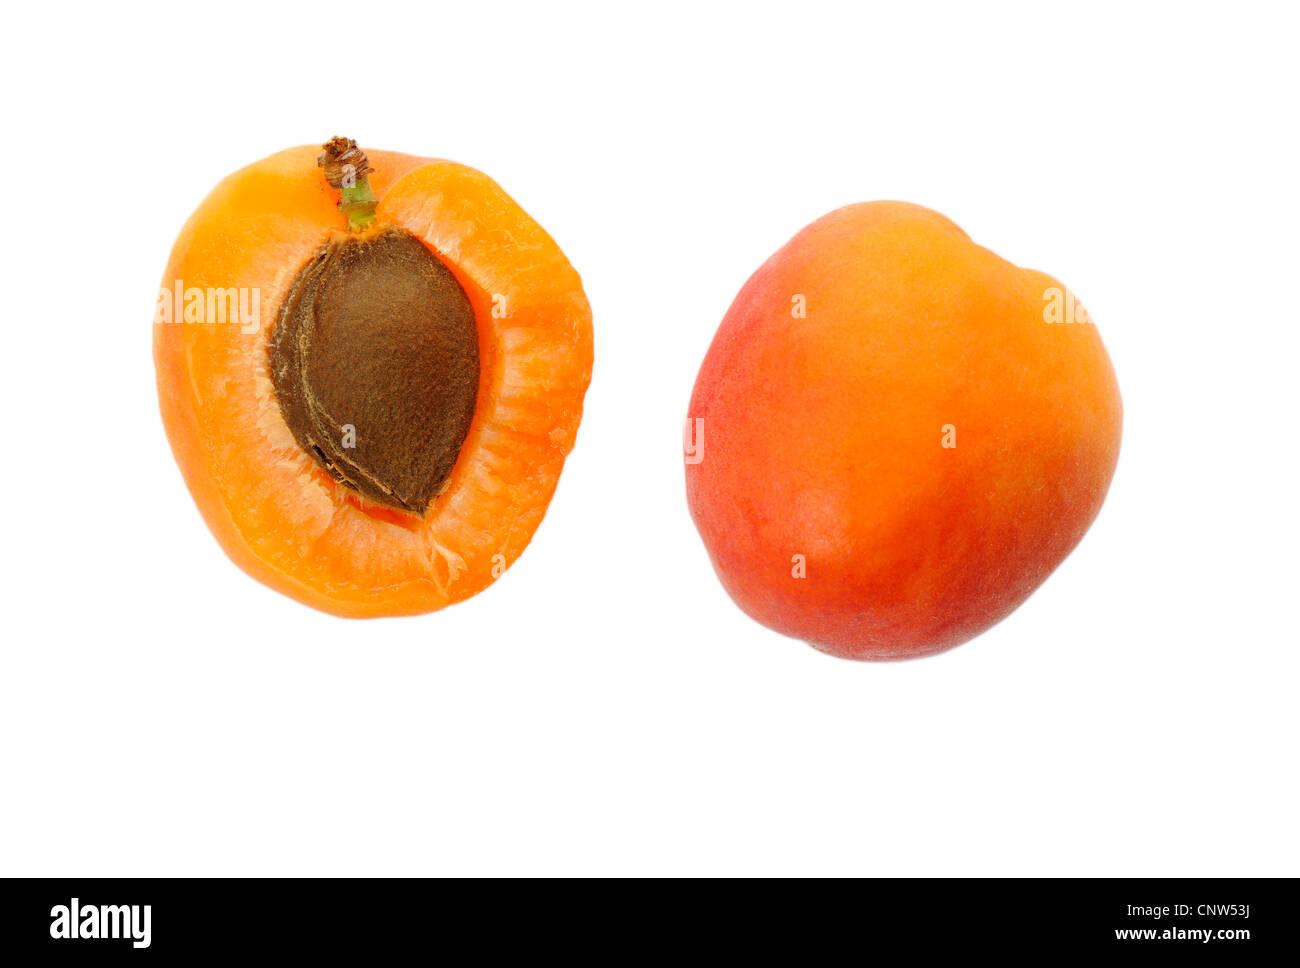 apricot tree (Prunus armeniaca), cut and complete apricot - Stock Image